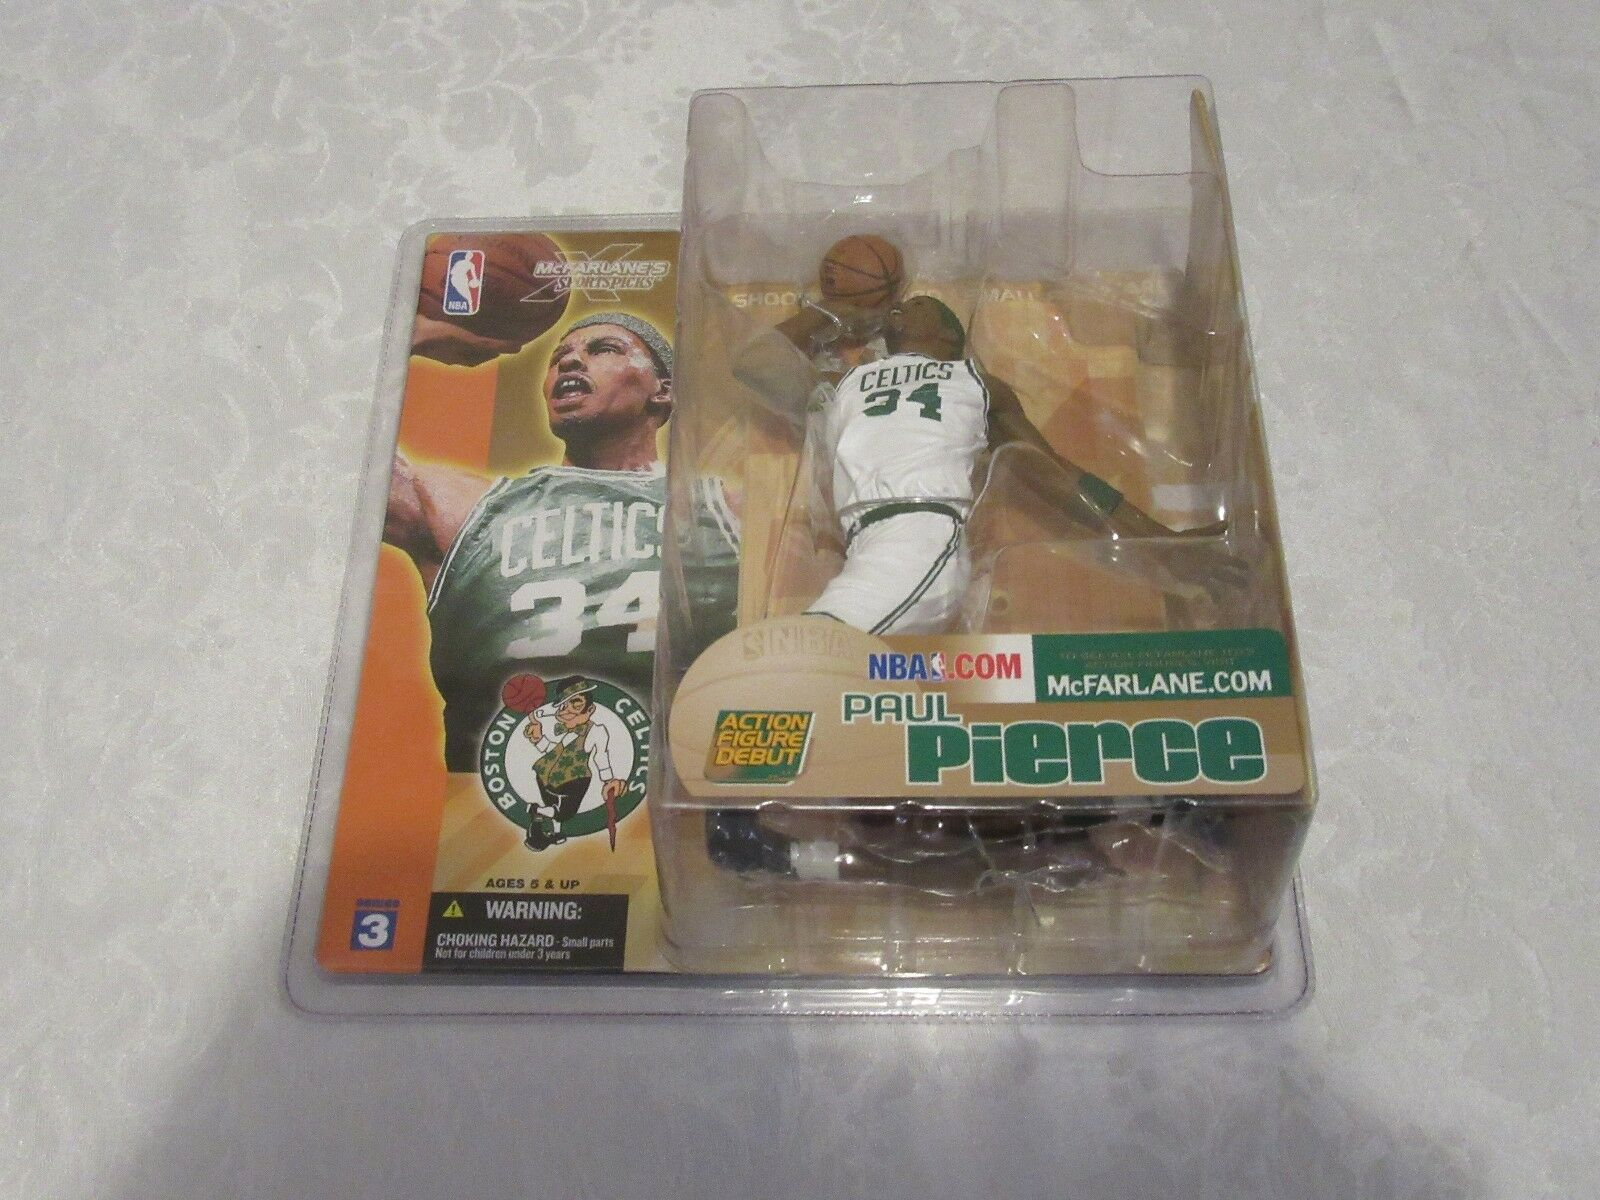 McFarlane NBA Series 3 Paul Pierce Chase Variant bianca Jersey Celtics Figure